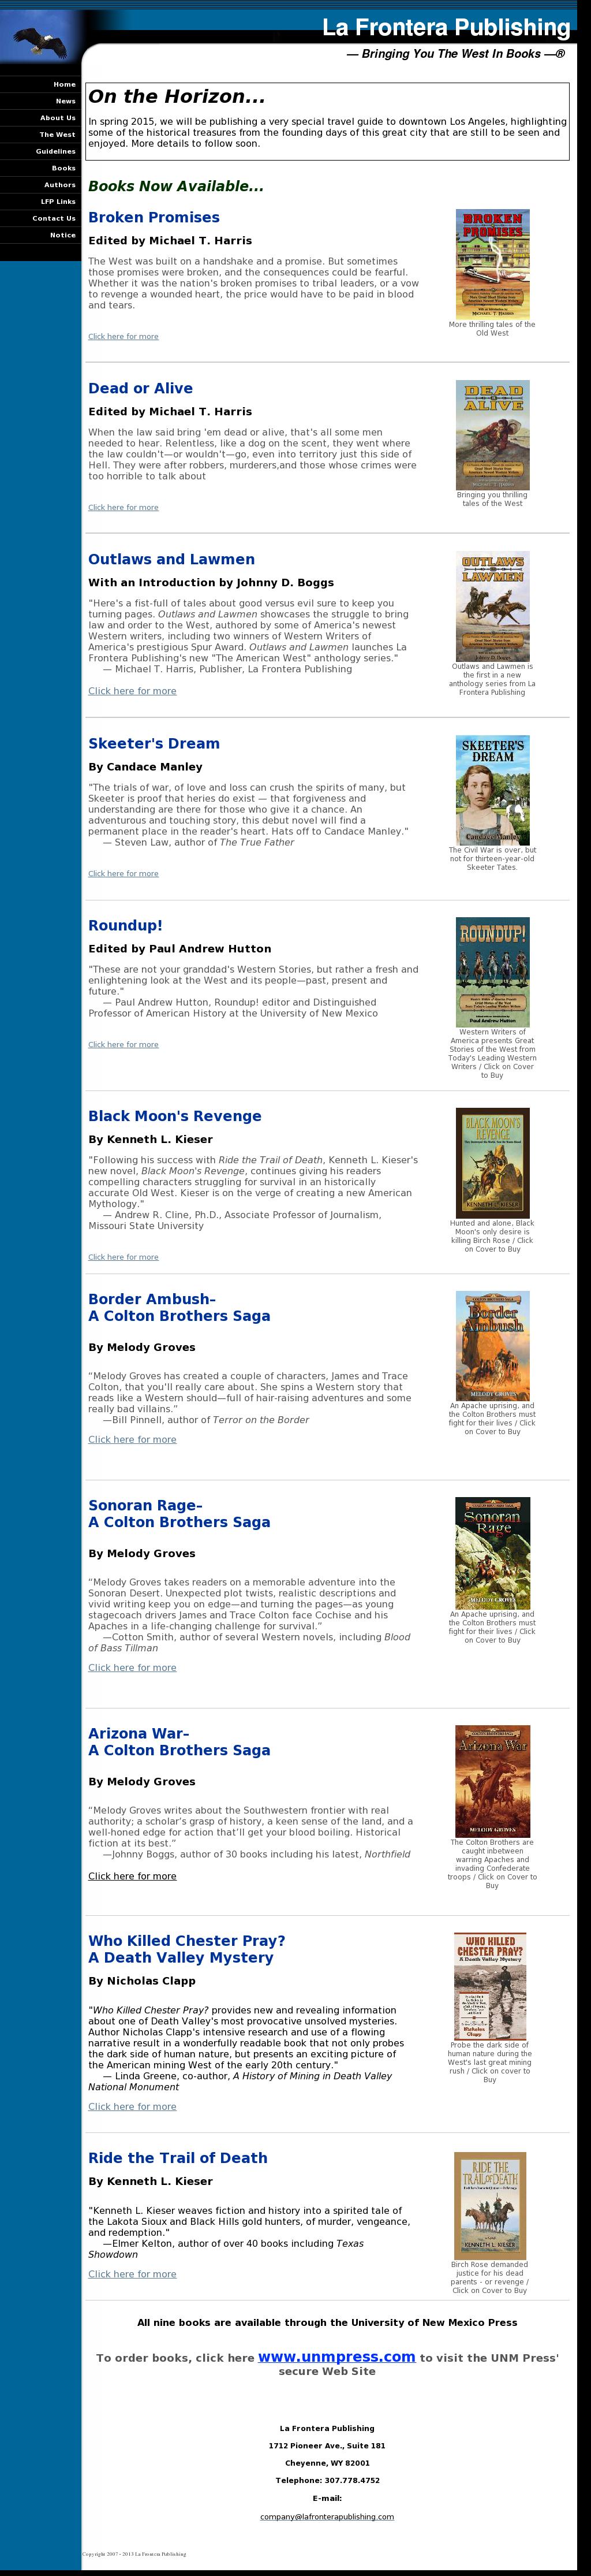 La Frontera Publishing Competitors, Revenue and Employees - Owler